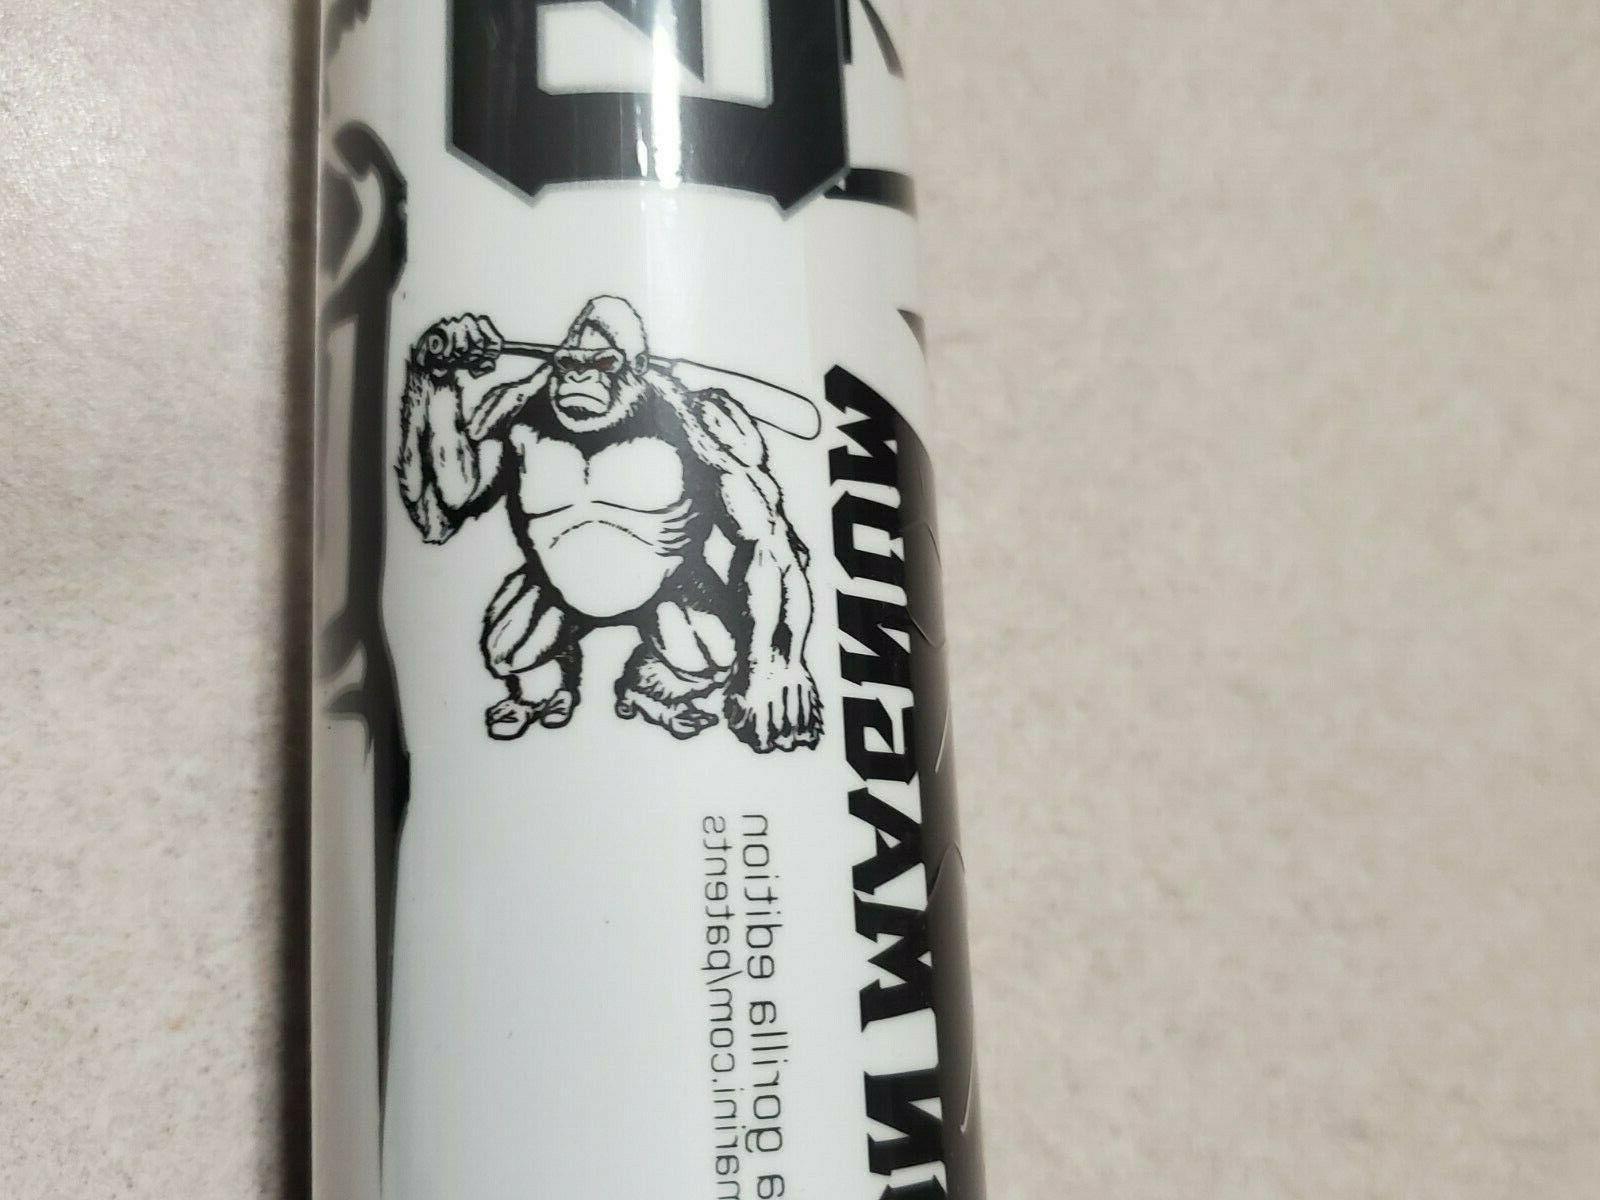 New DeMarini USSSA Magnum WTDXNAM-21 26.5